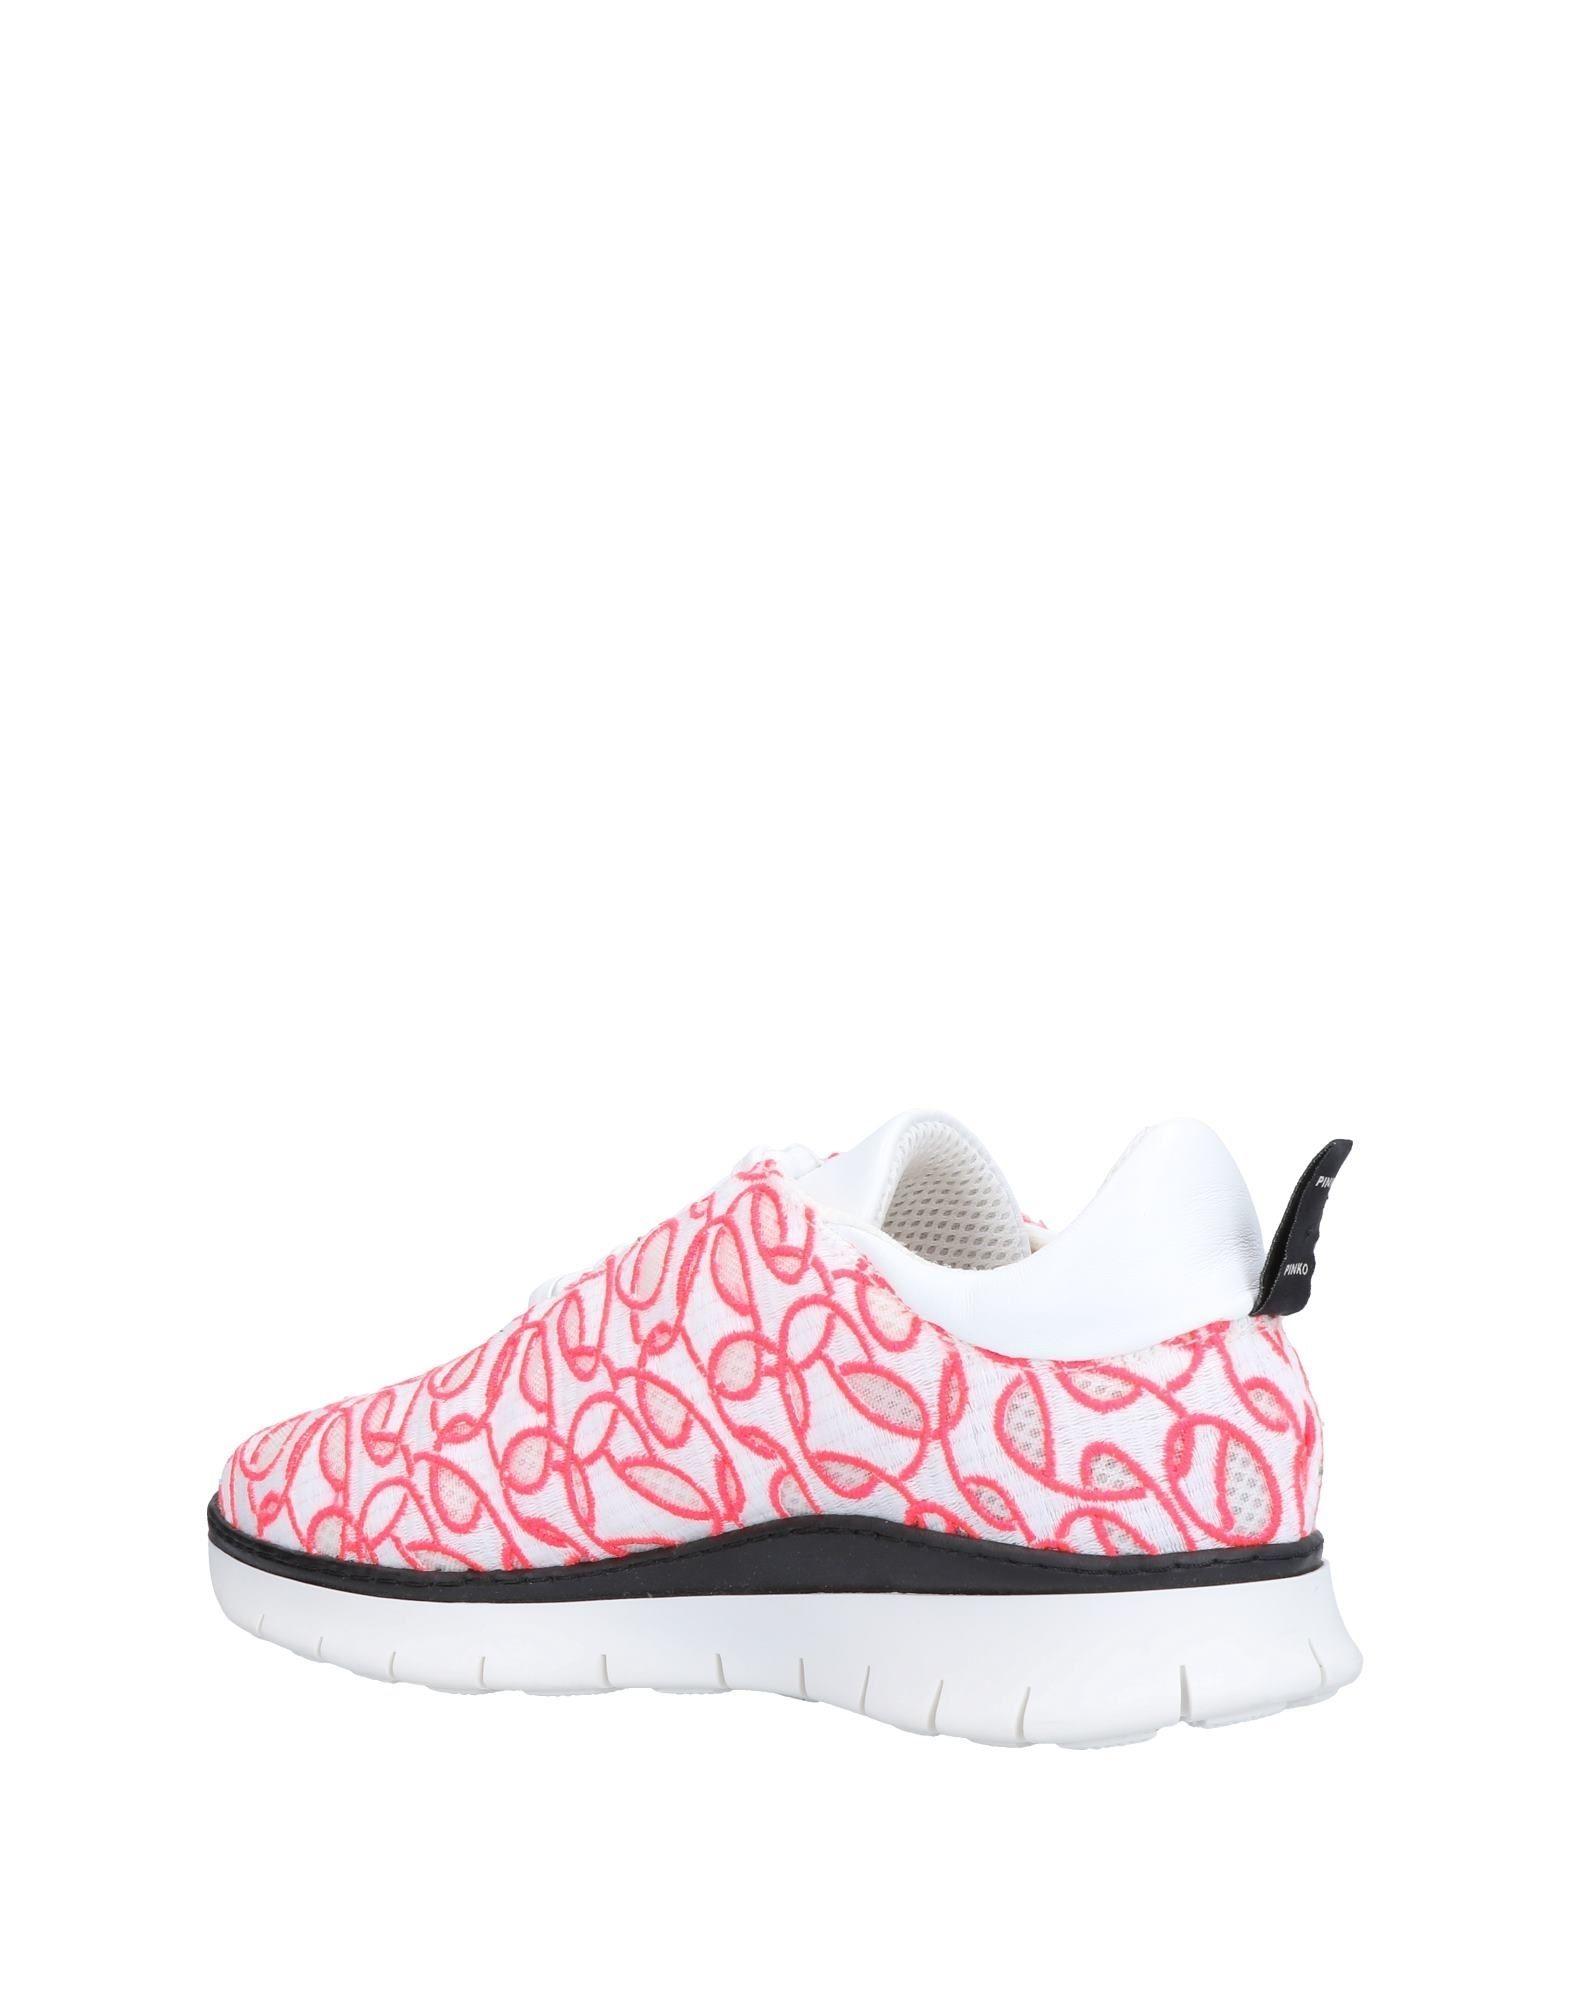 Pinko Sneakers - Women Pinko Sneakers online on    United Kingdom - 11504793TH 4f1dc8